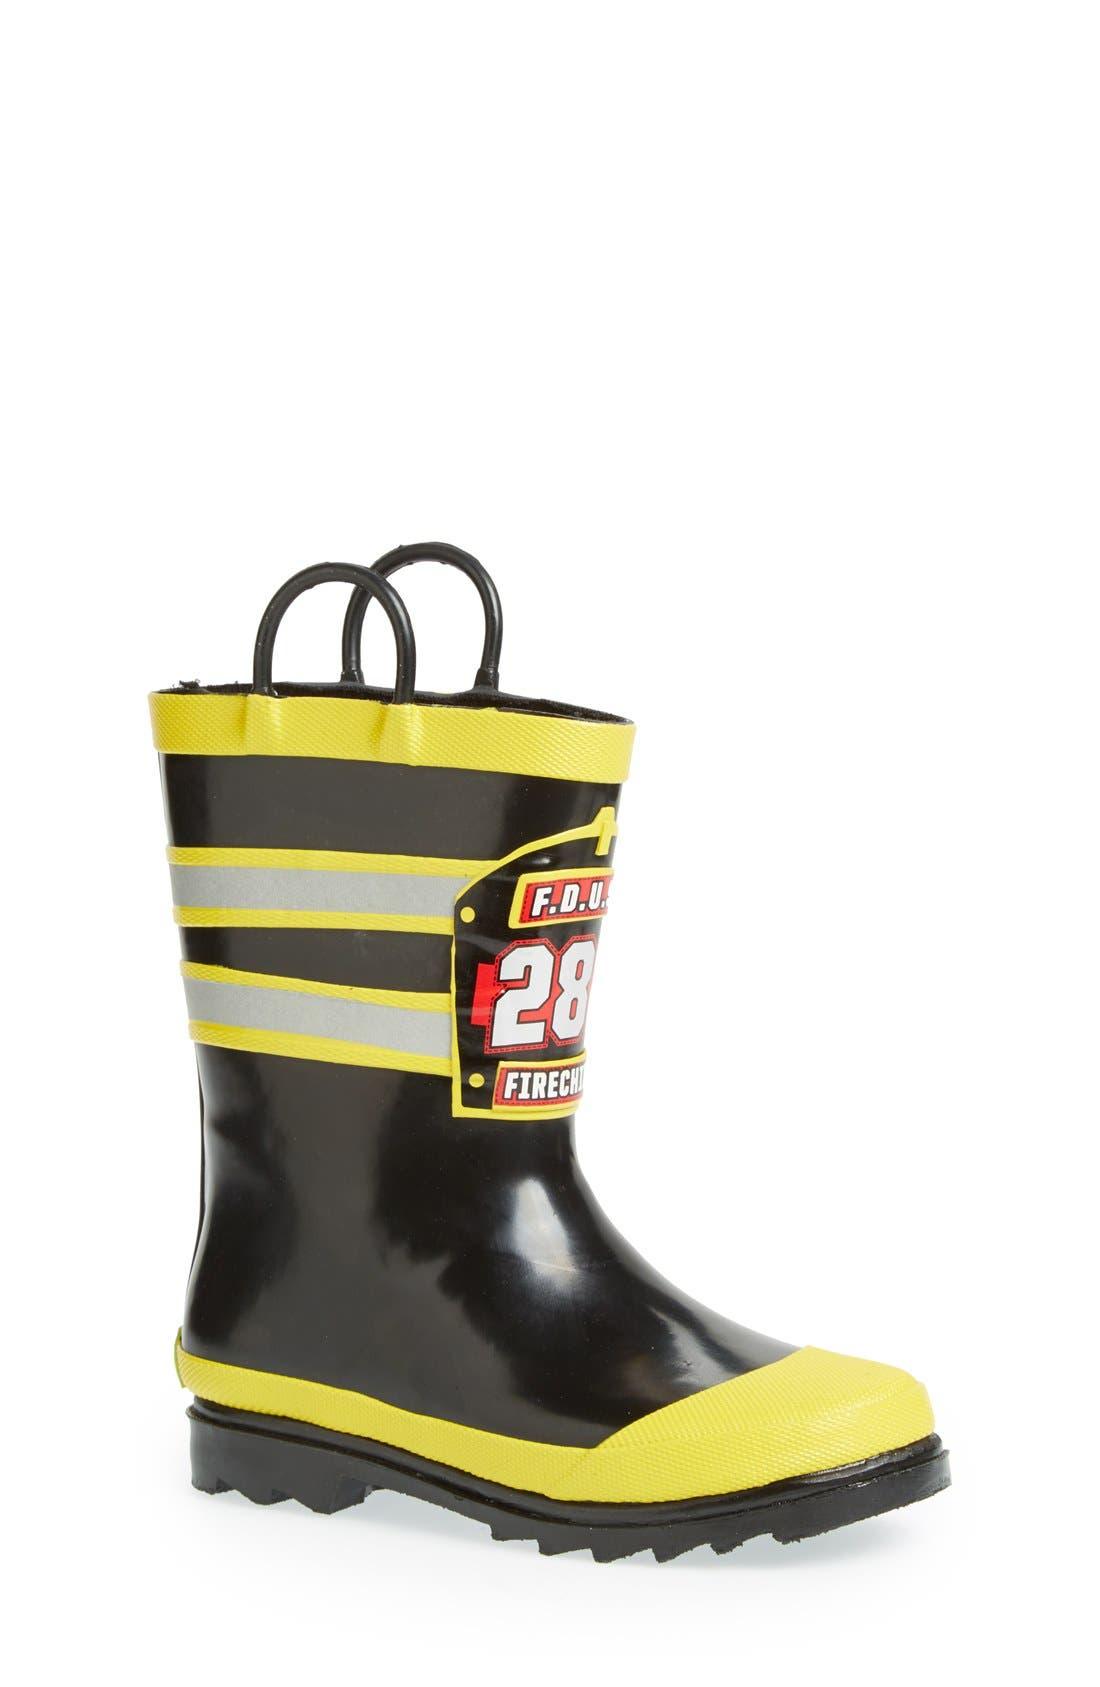 WESTERN CHIEF F.D.U.S.A. Waterproof Rain Boot, Main, color, BLACK